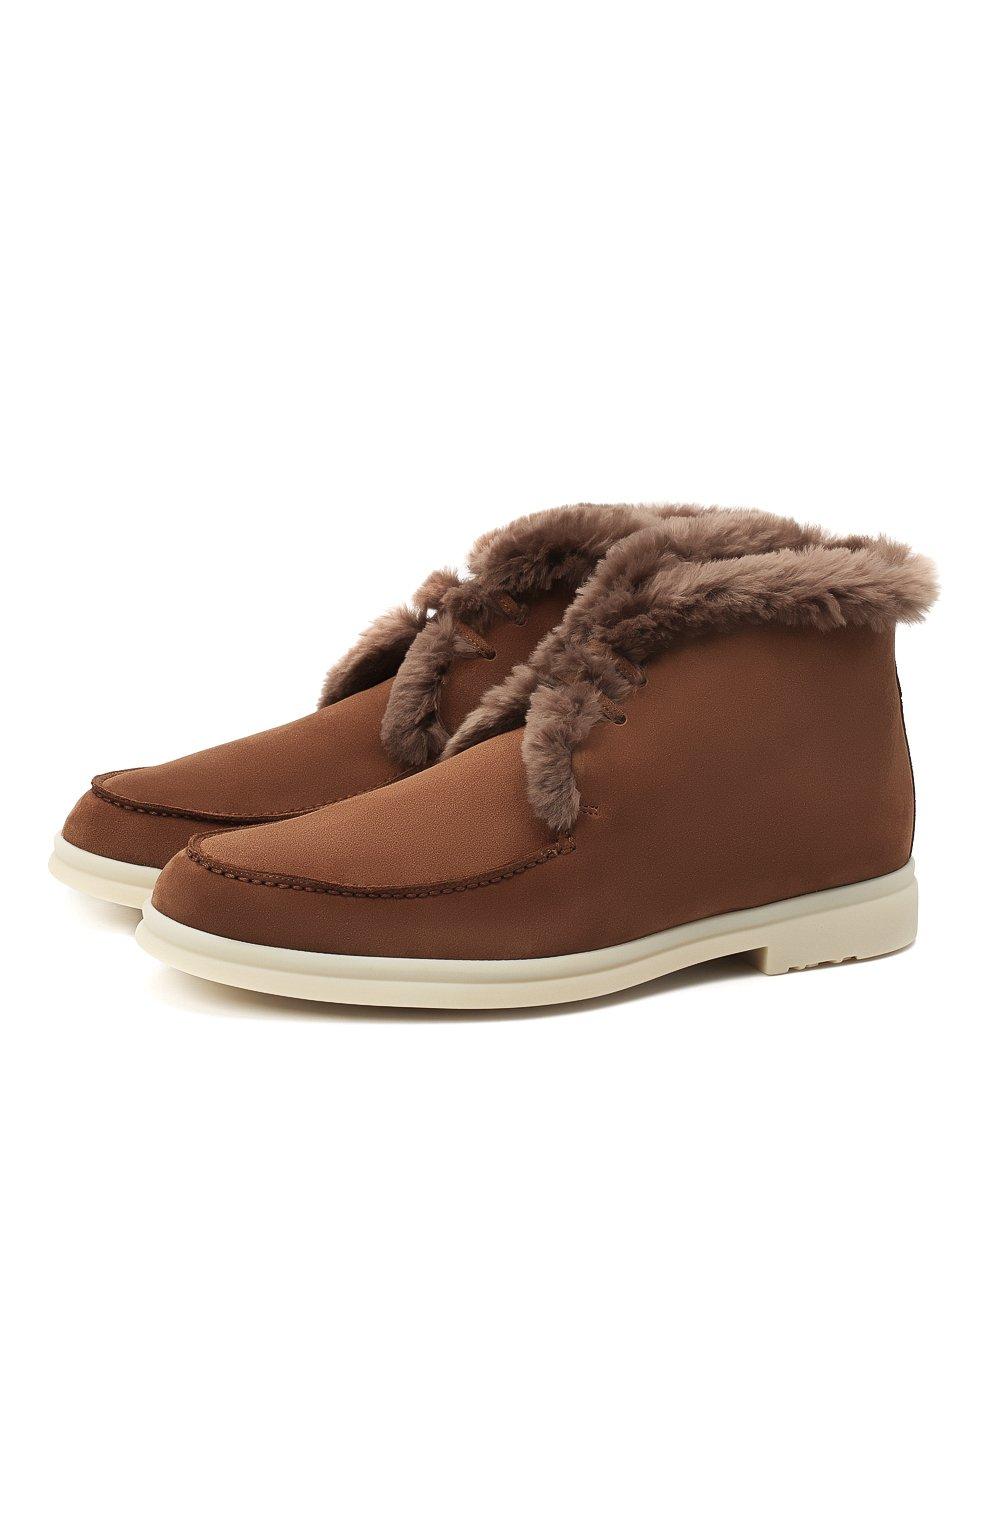 Мужские замшевые ботинки walk and walk LORO PIANA светло-коричневого цвета, арт. FAE5014 | Фото 1